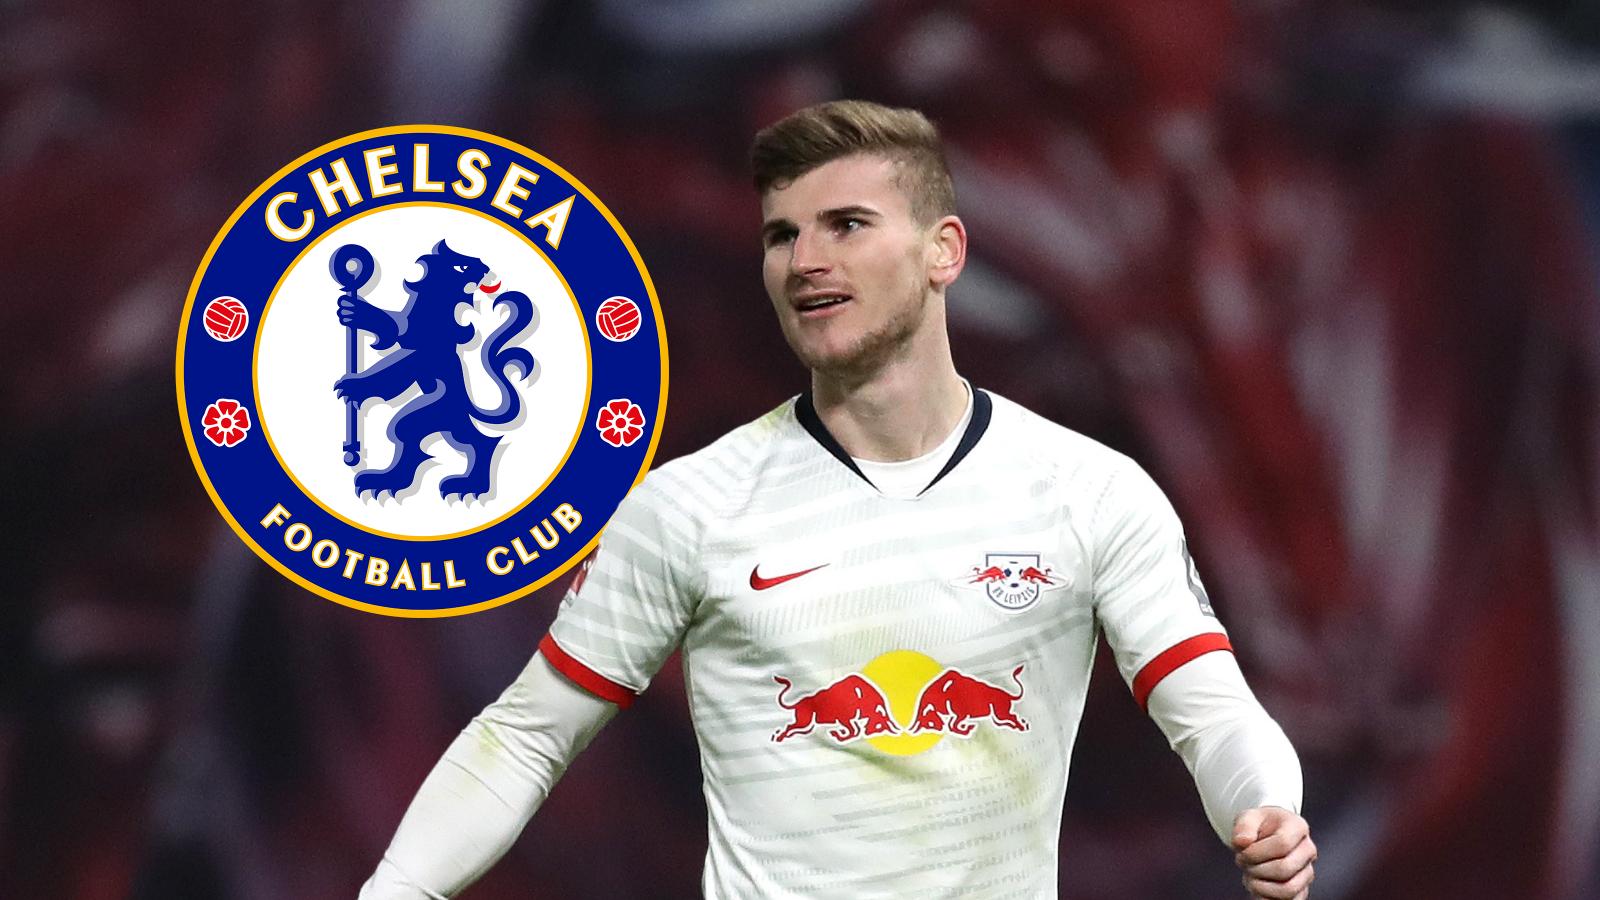 Chelsea complete signing of RB Leipzig striker, Timo Werner